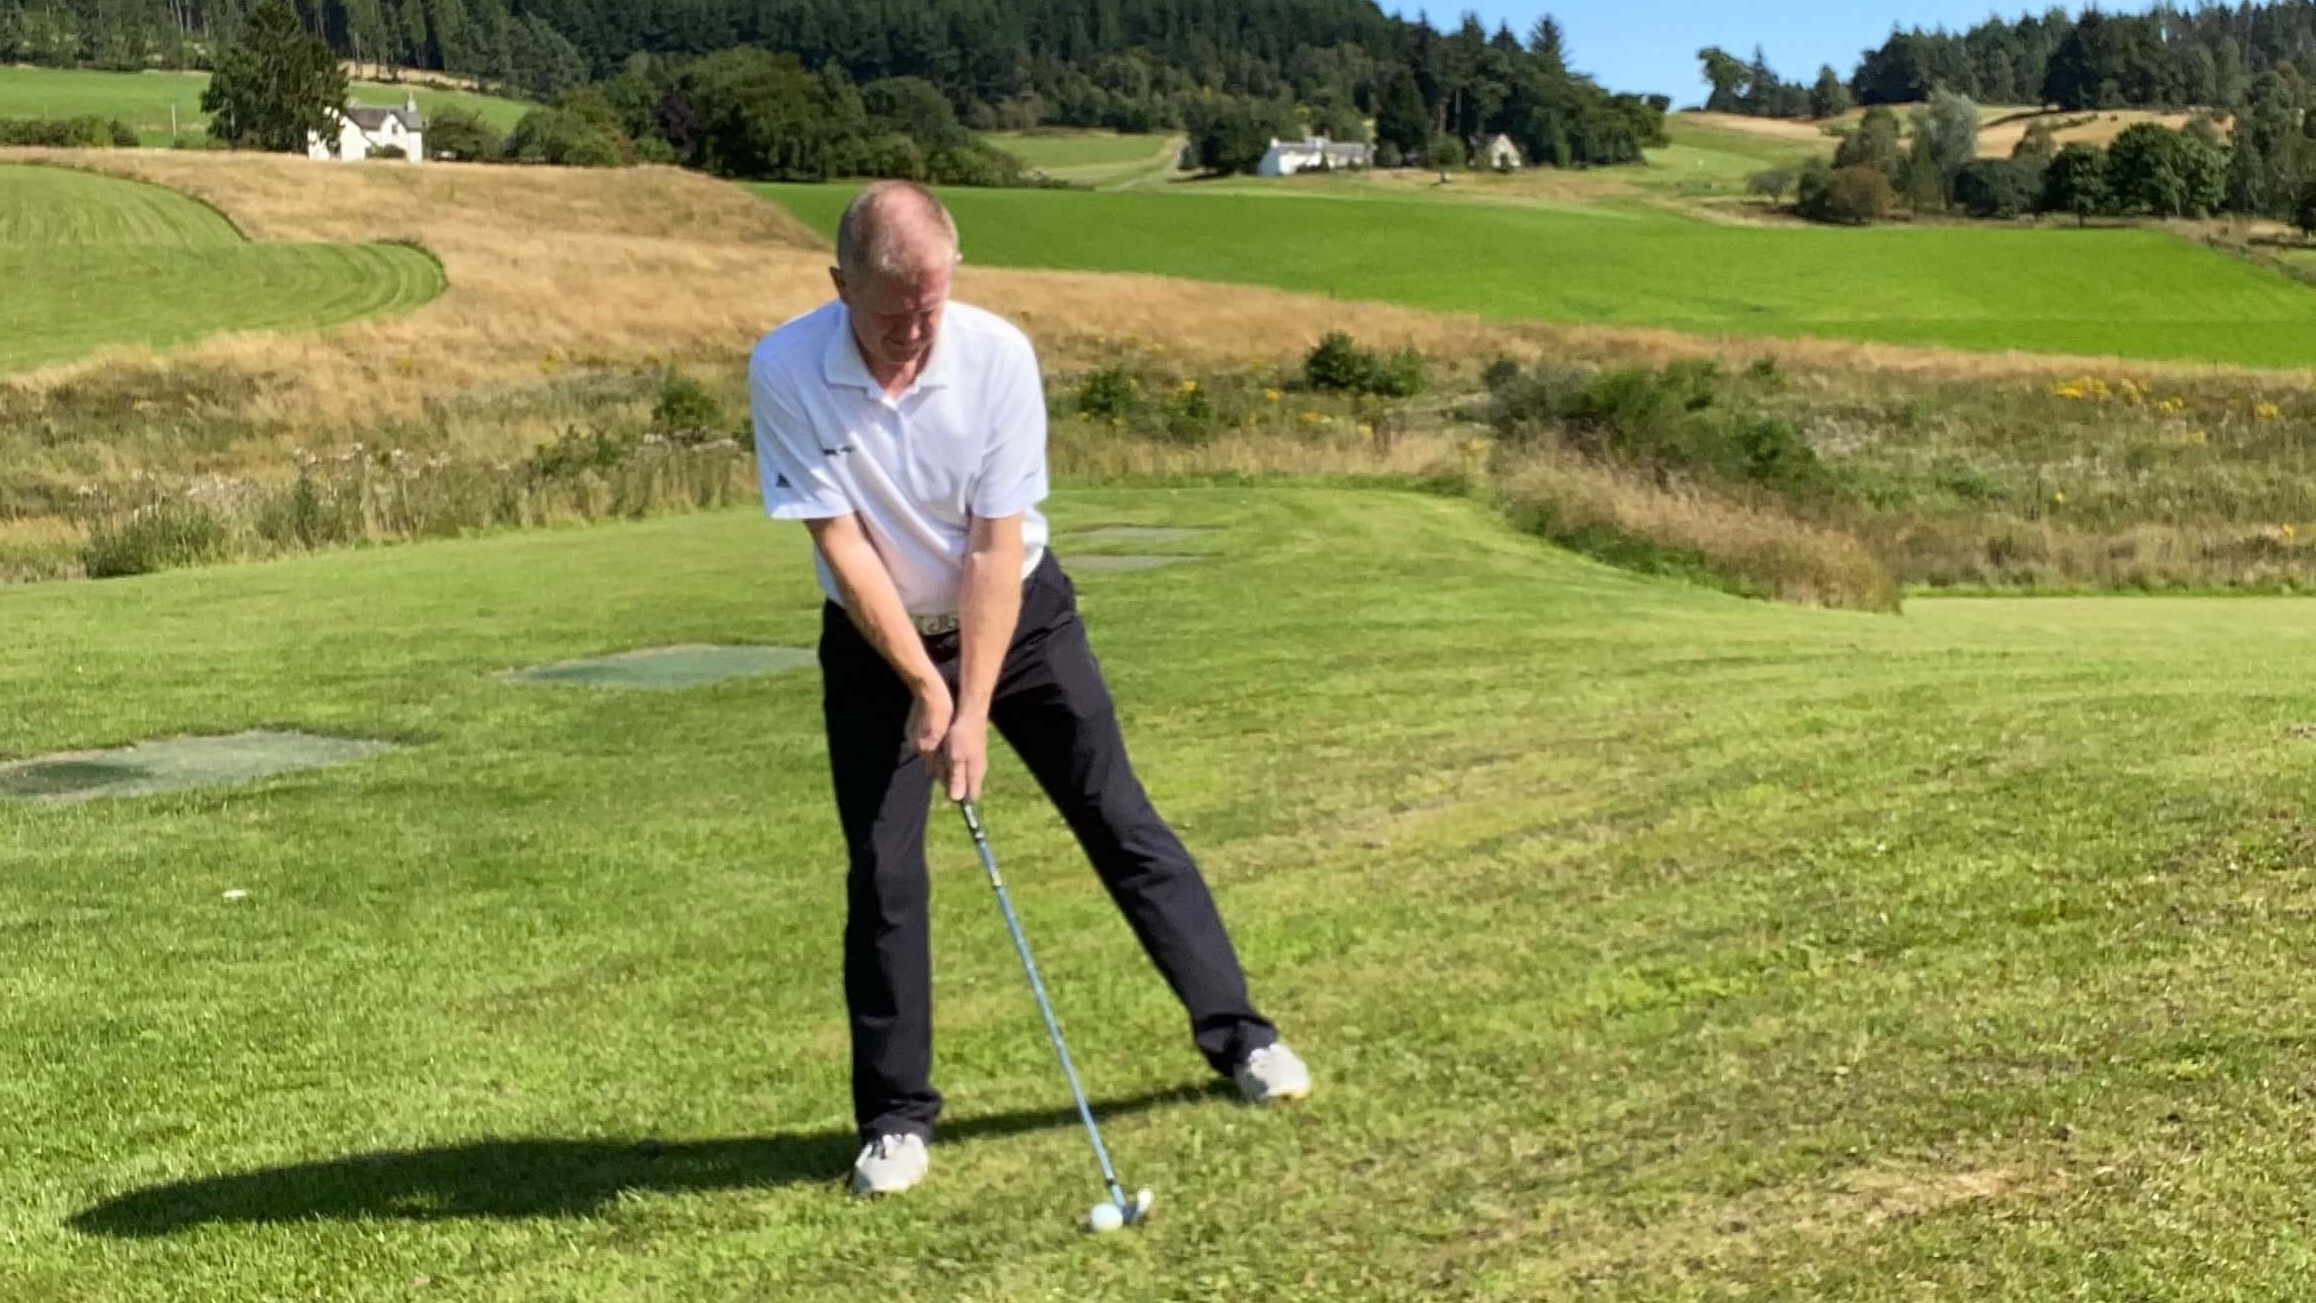 Awkward Lies in Golf Part 2